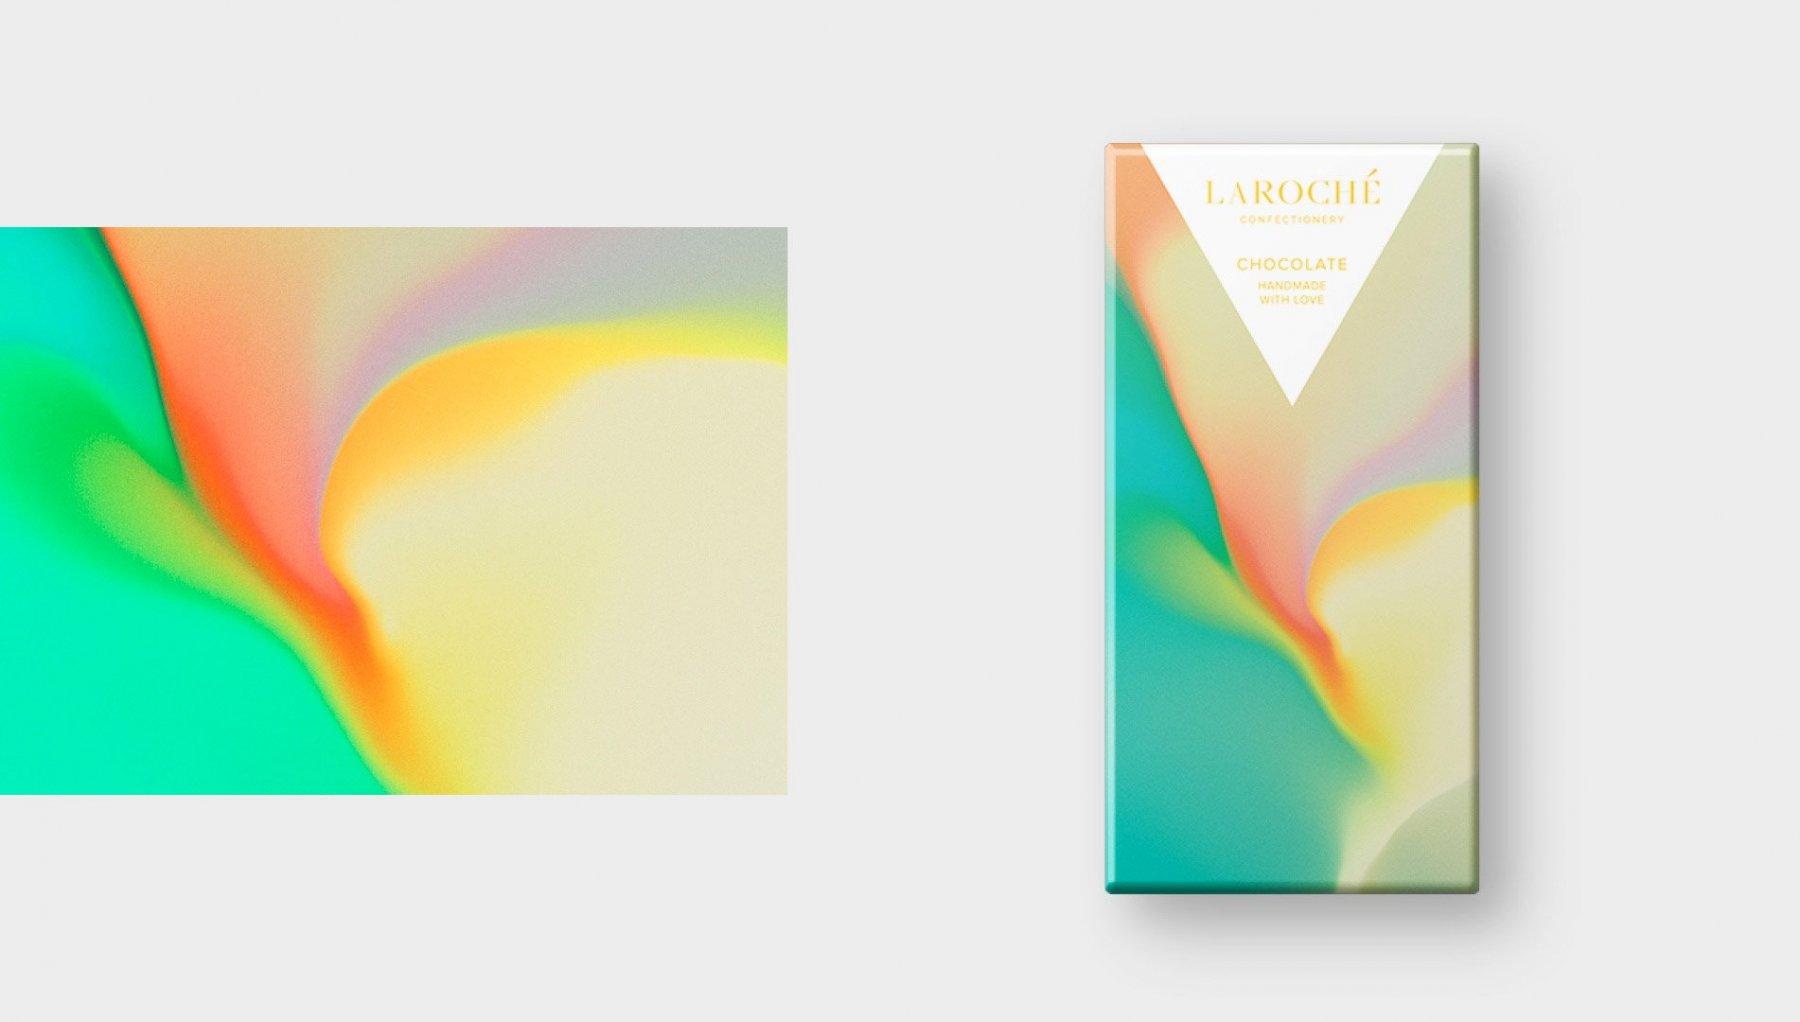 Laroche-Chocolate-Packaging-by-Martin-Naumann-04